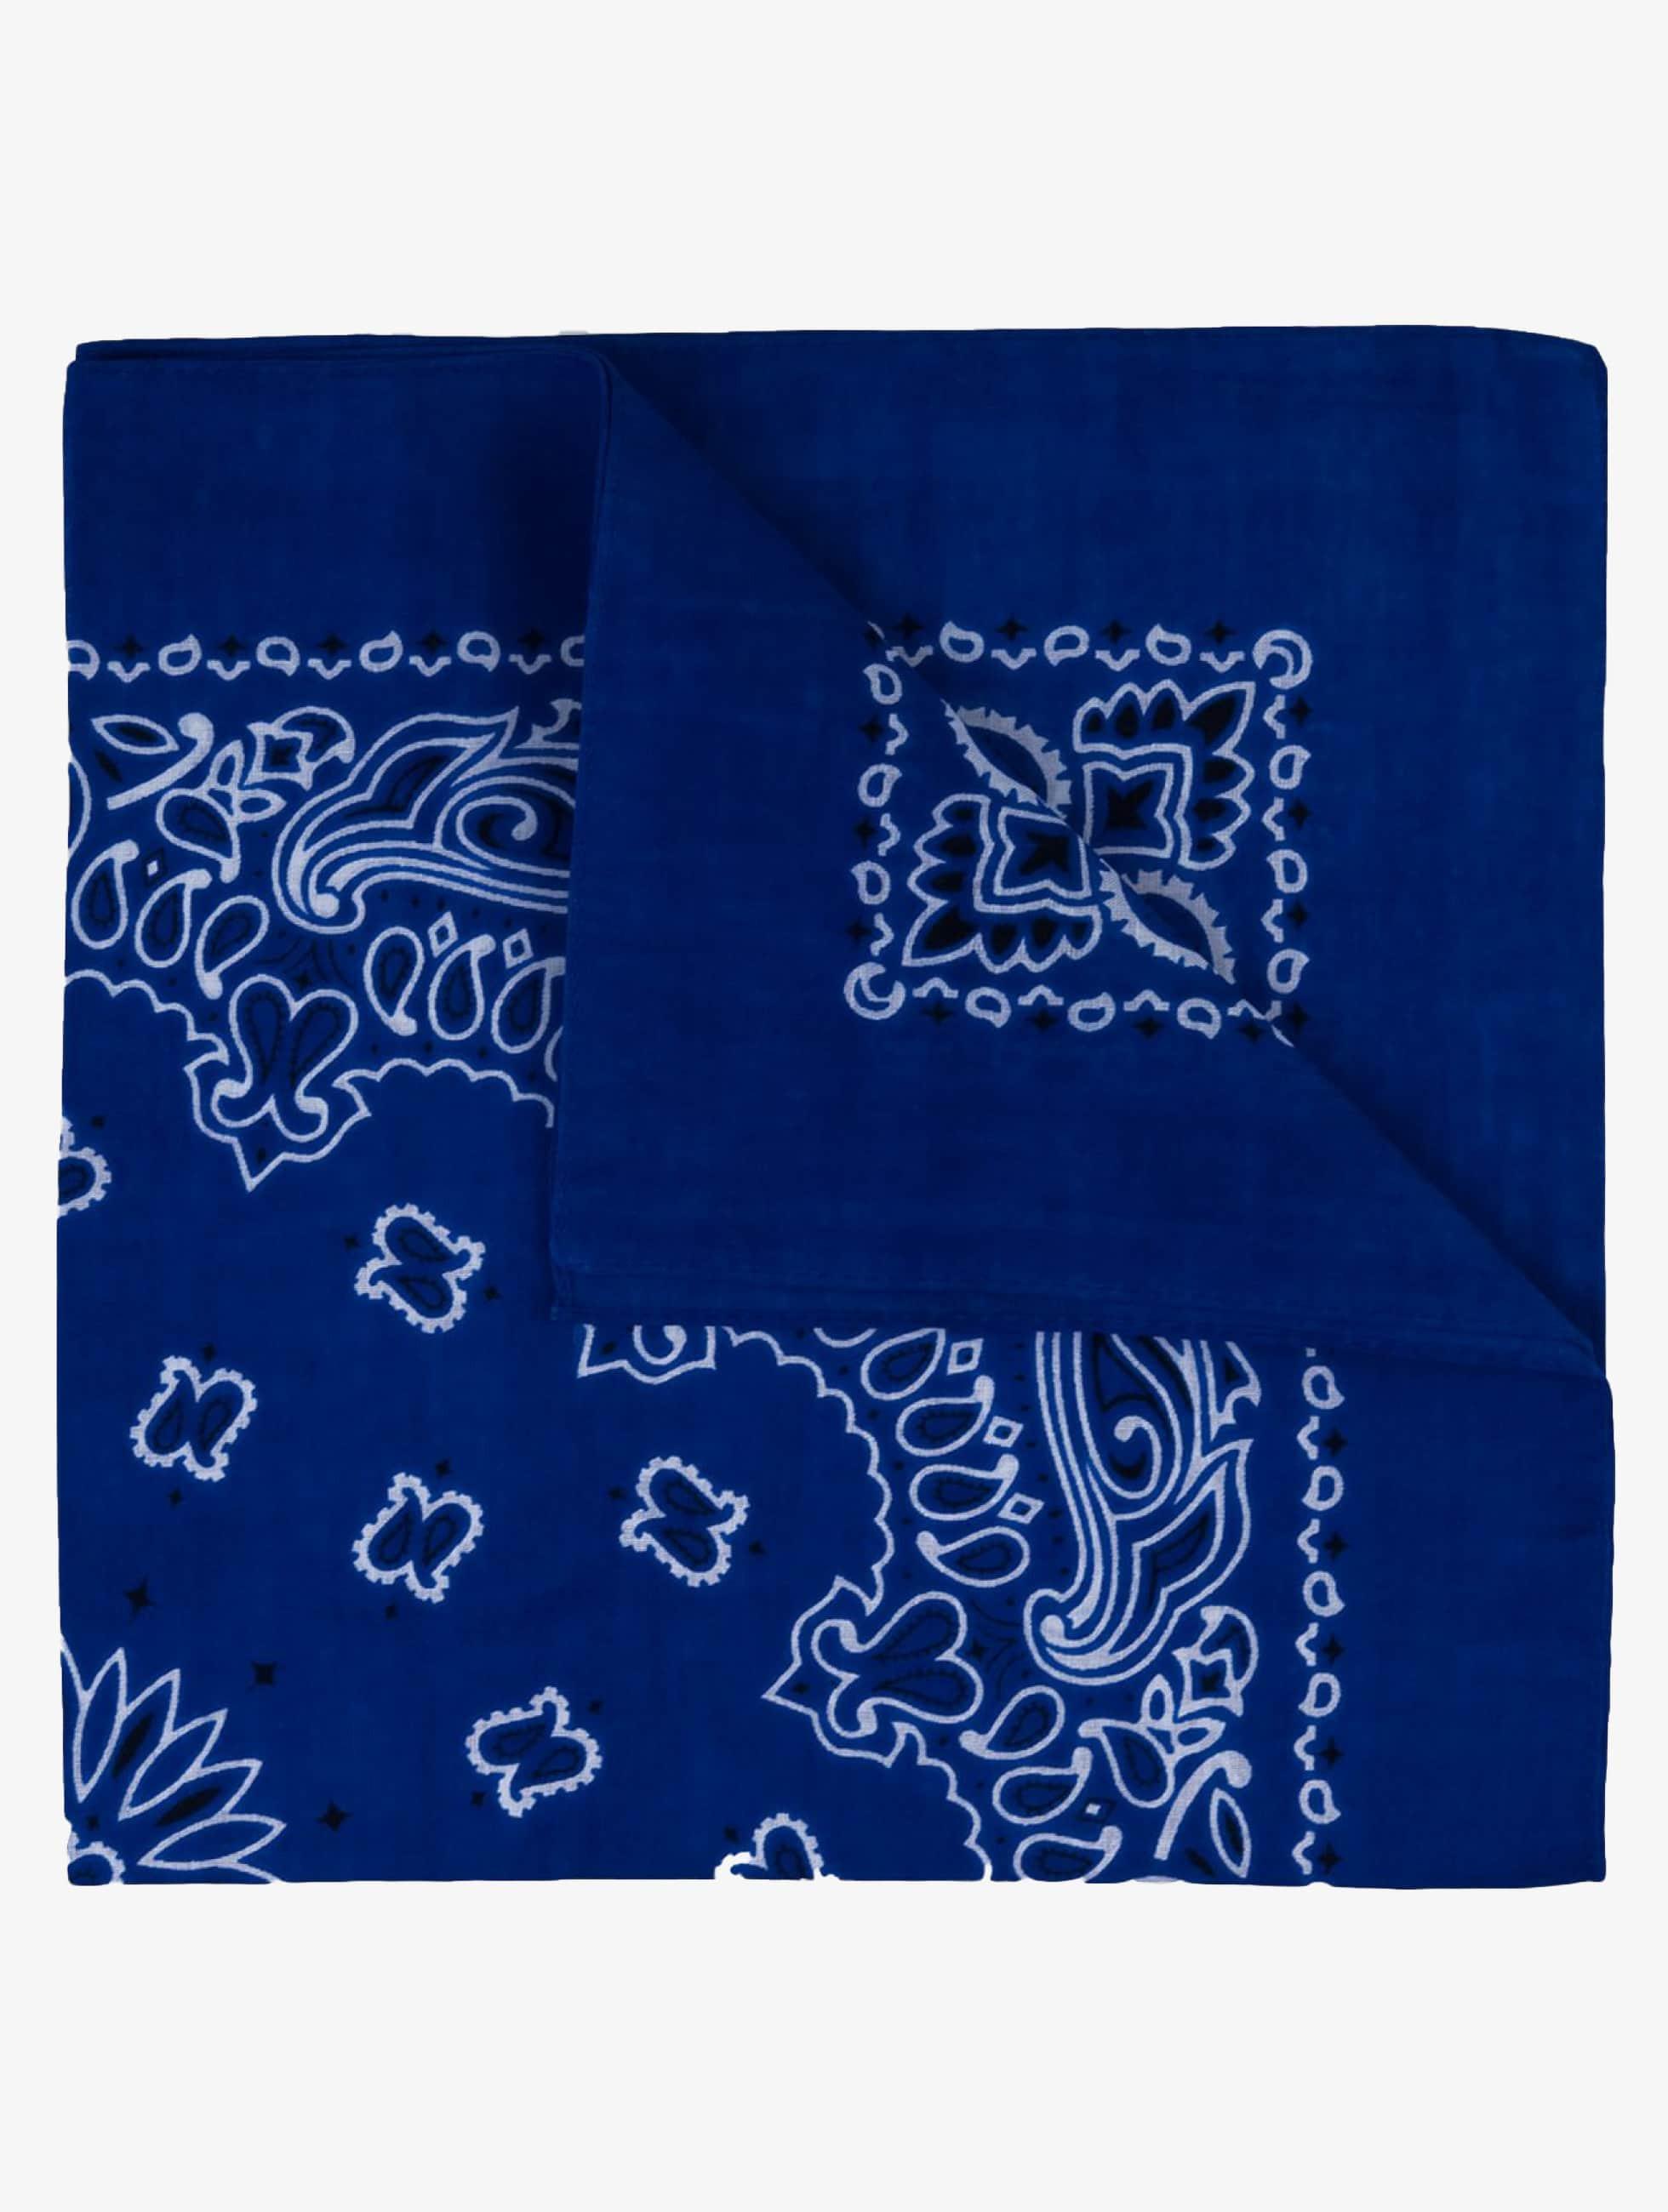 MSTRDS Männer,Frauen Bandana Printed in blau